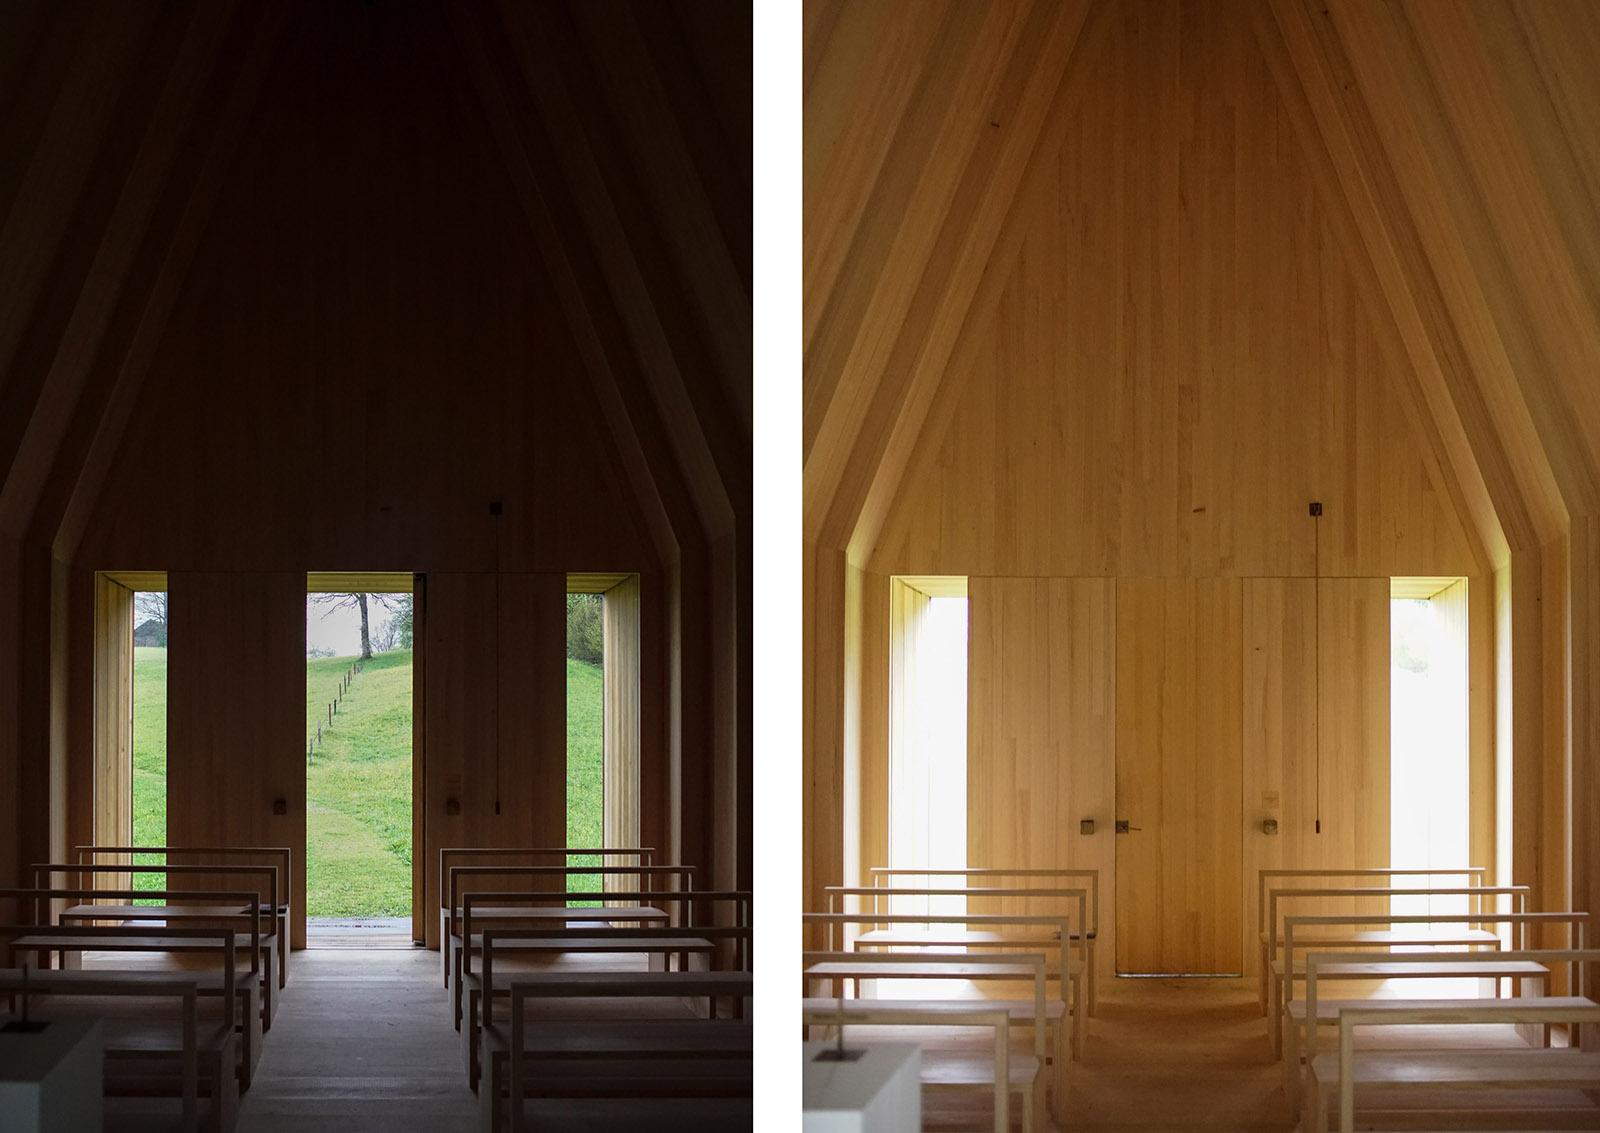 salgenreute-chapel-bernardo-bader-photo-jean-nicolas-lechat-urbantyper-6